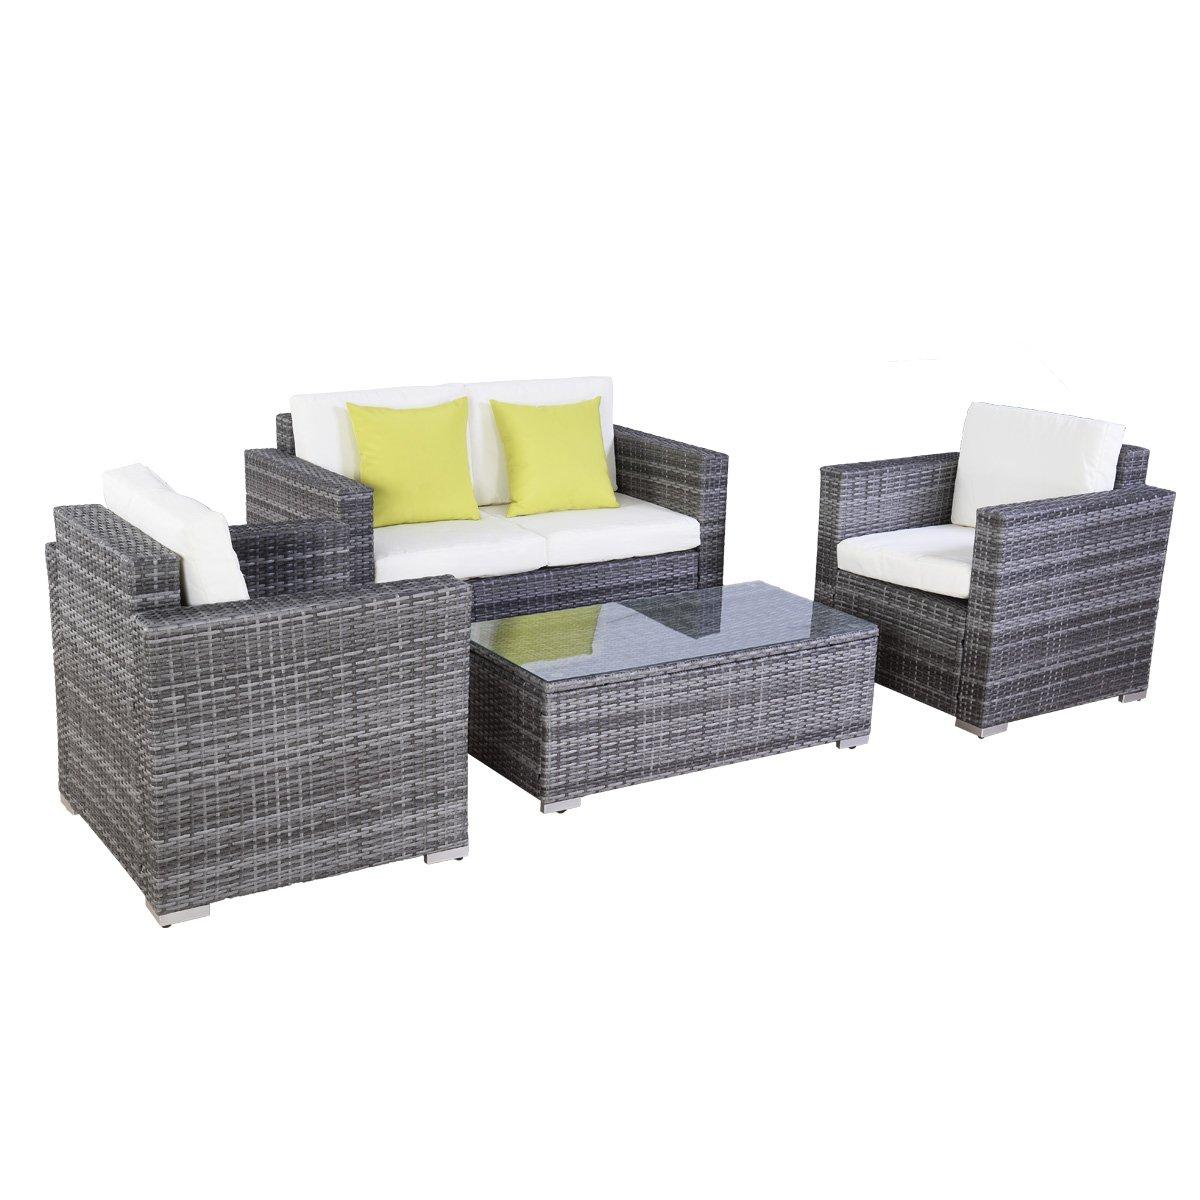 Gartenmöbel sitzgruppe rattan lounge  Poly Ratten Lounge Gartenmöbel Rattan Lounge Set Garnitur ...